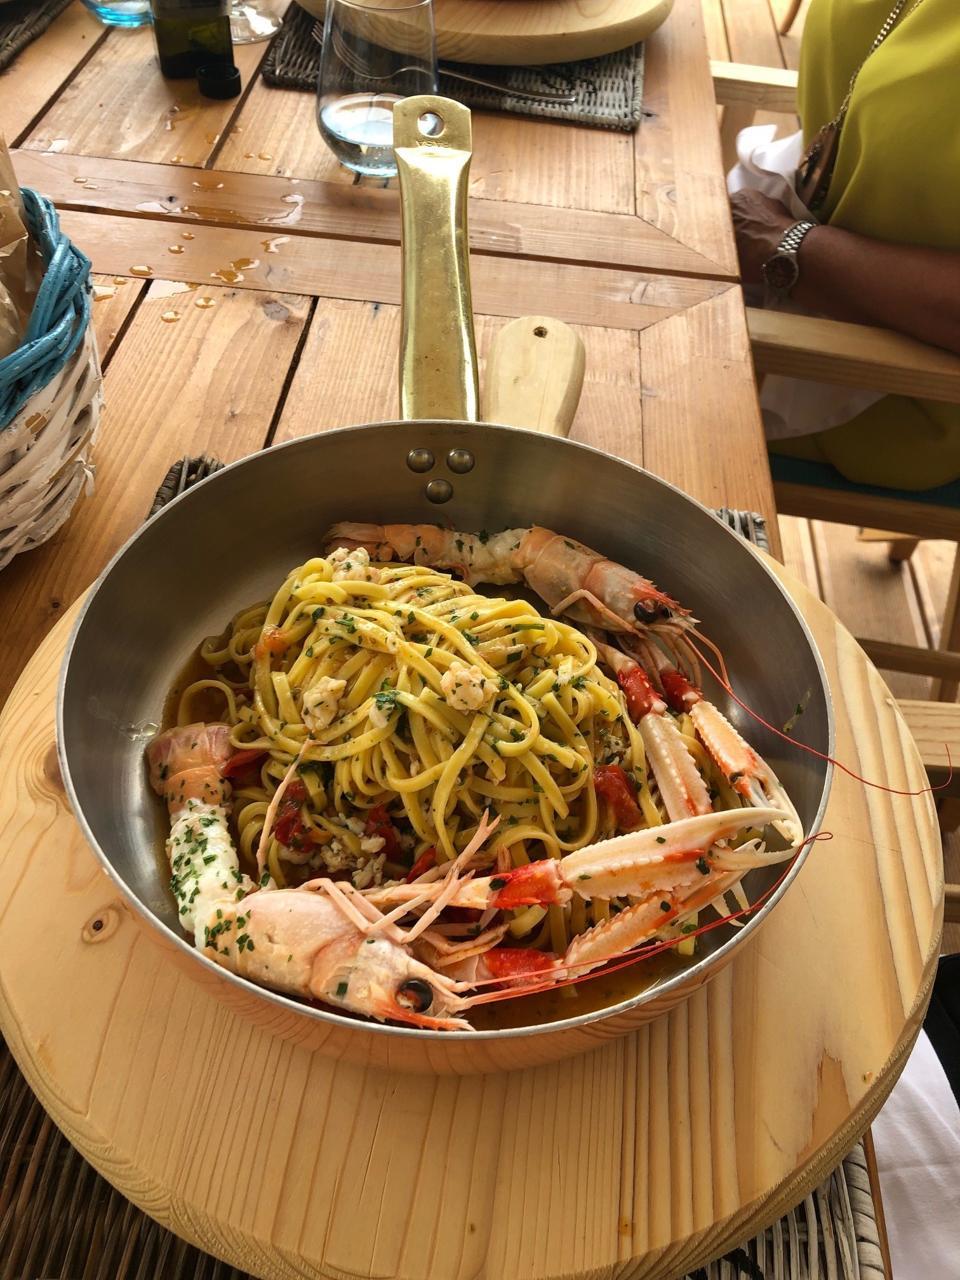 A restaurant skillet with Puglia linguine agli scampi linguine pasta with king prawns